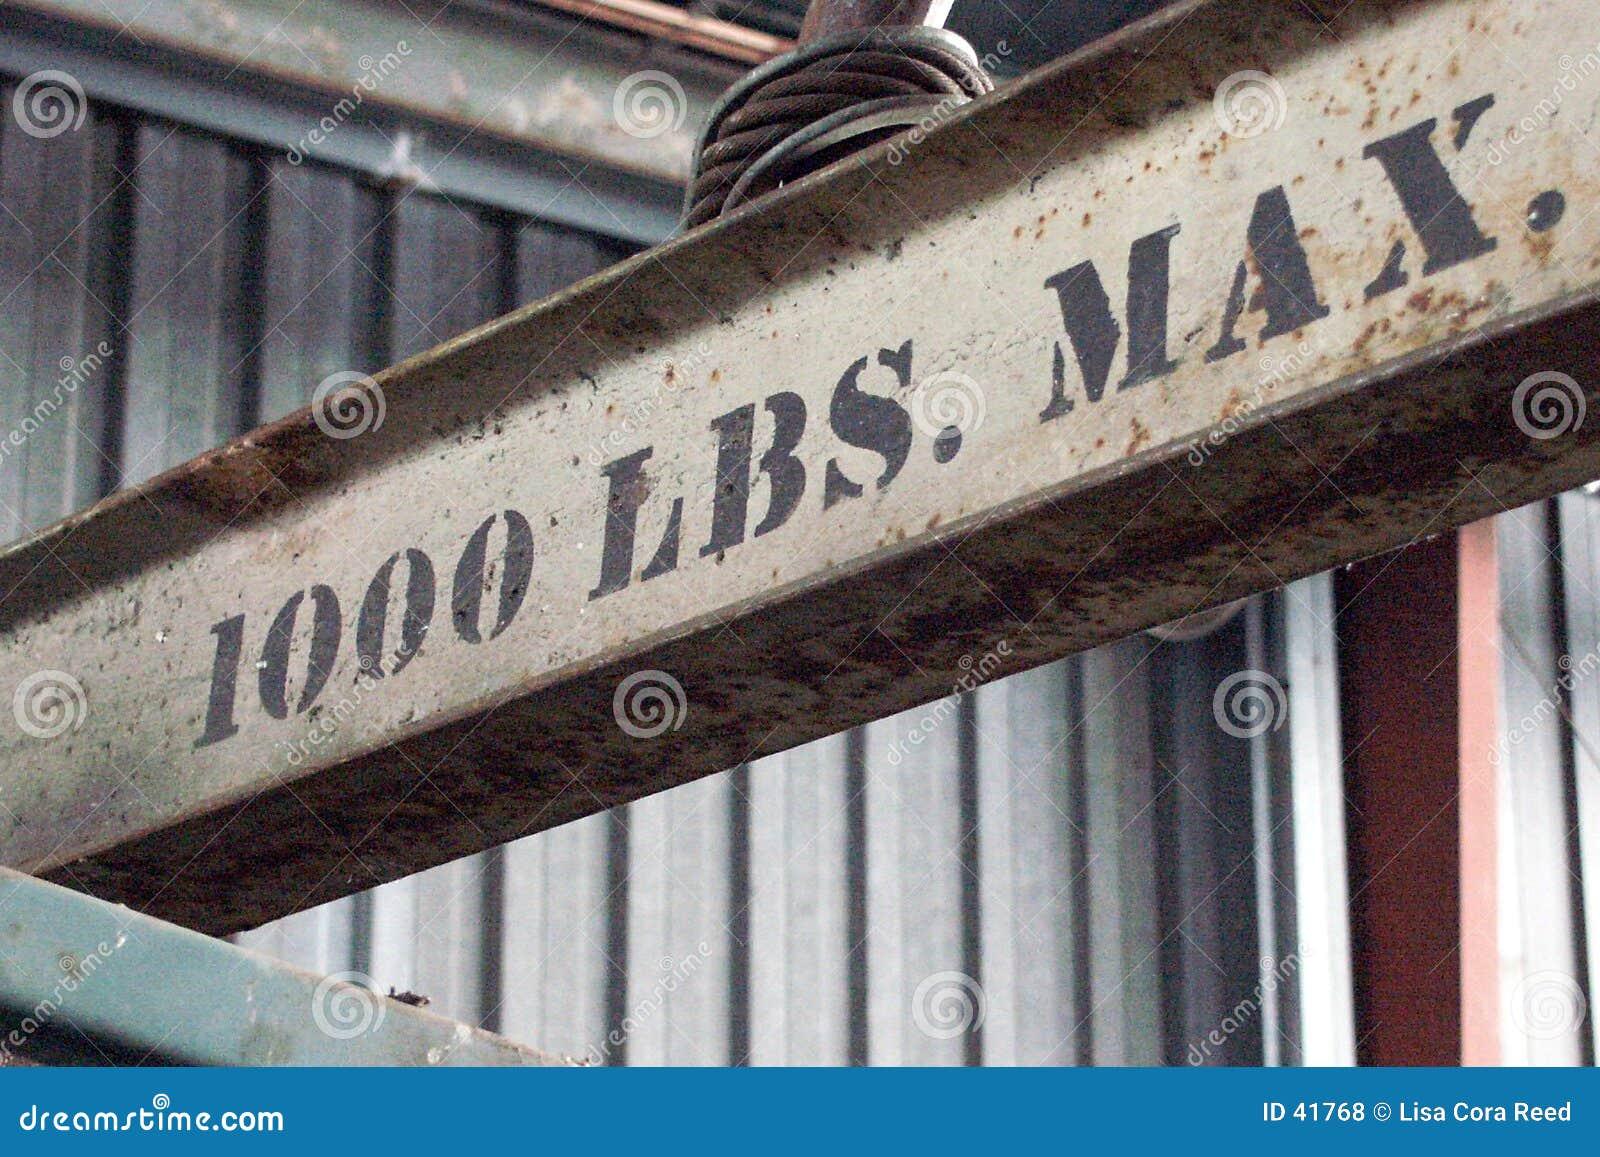 1000 lbs Max